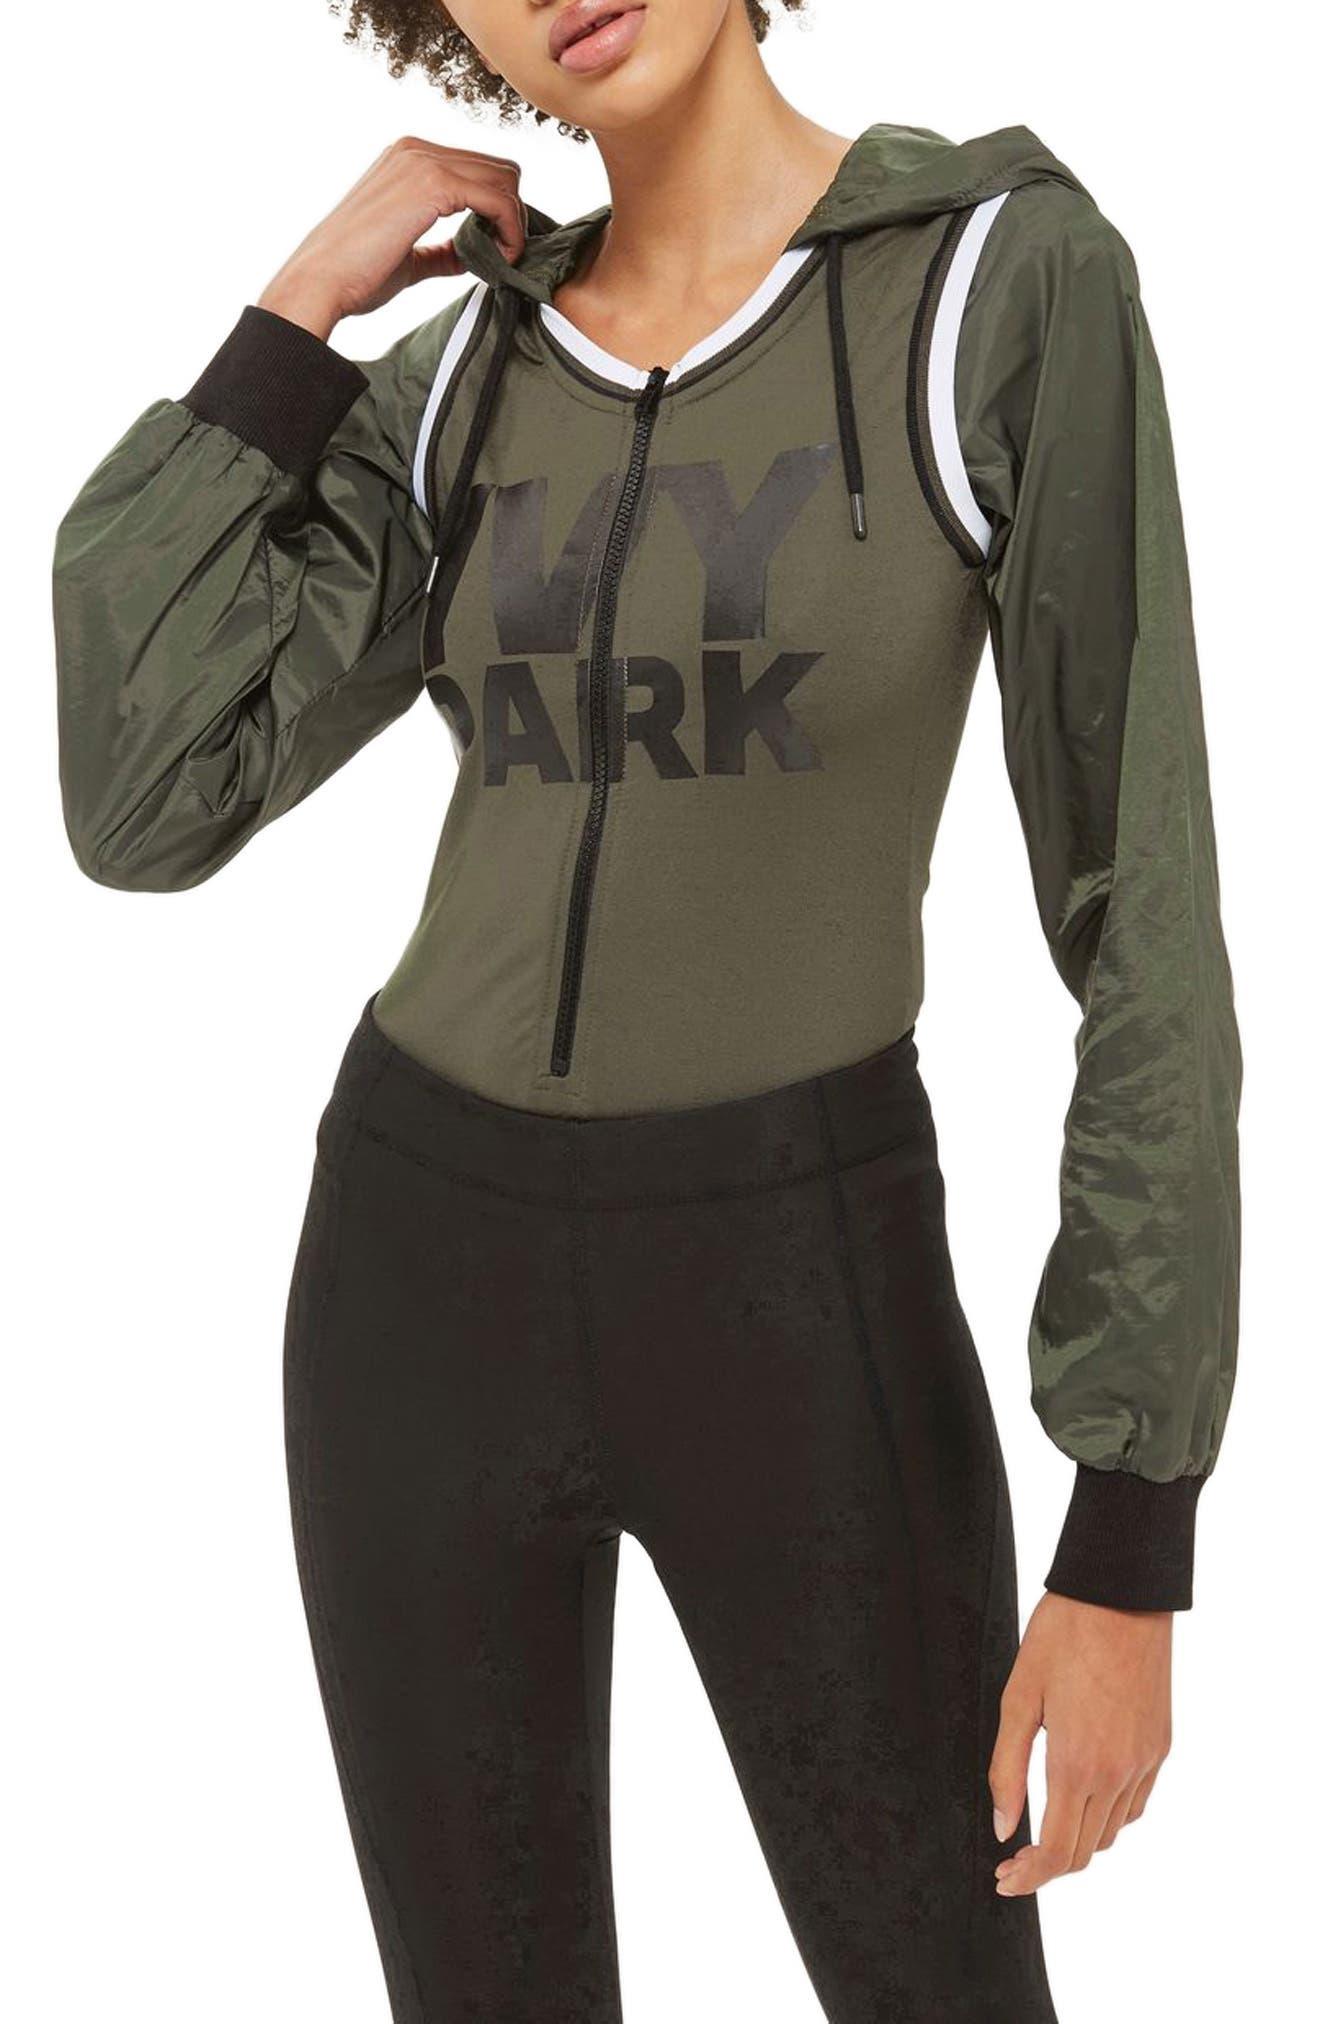 IVY PARK® Hooded Bodysuit